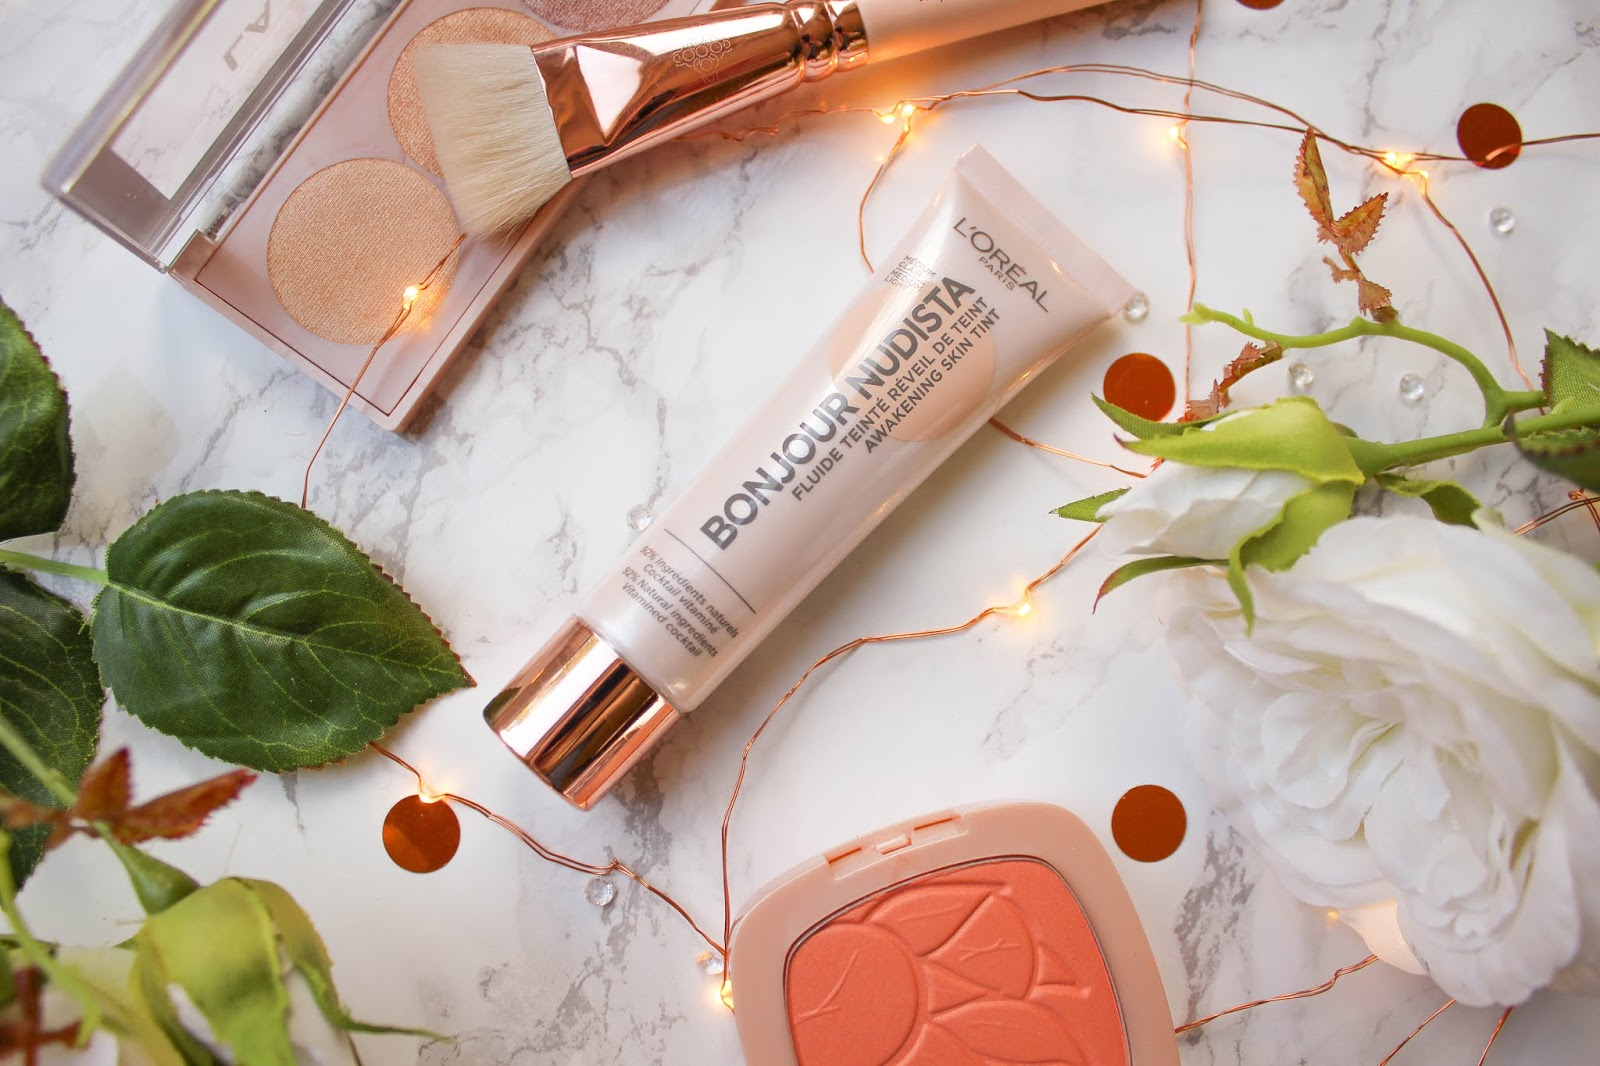 L'Oreal Bonjour Nudista Skin Tint BB Cream